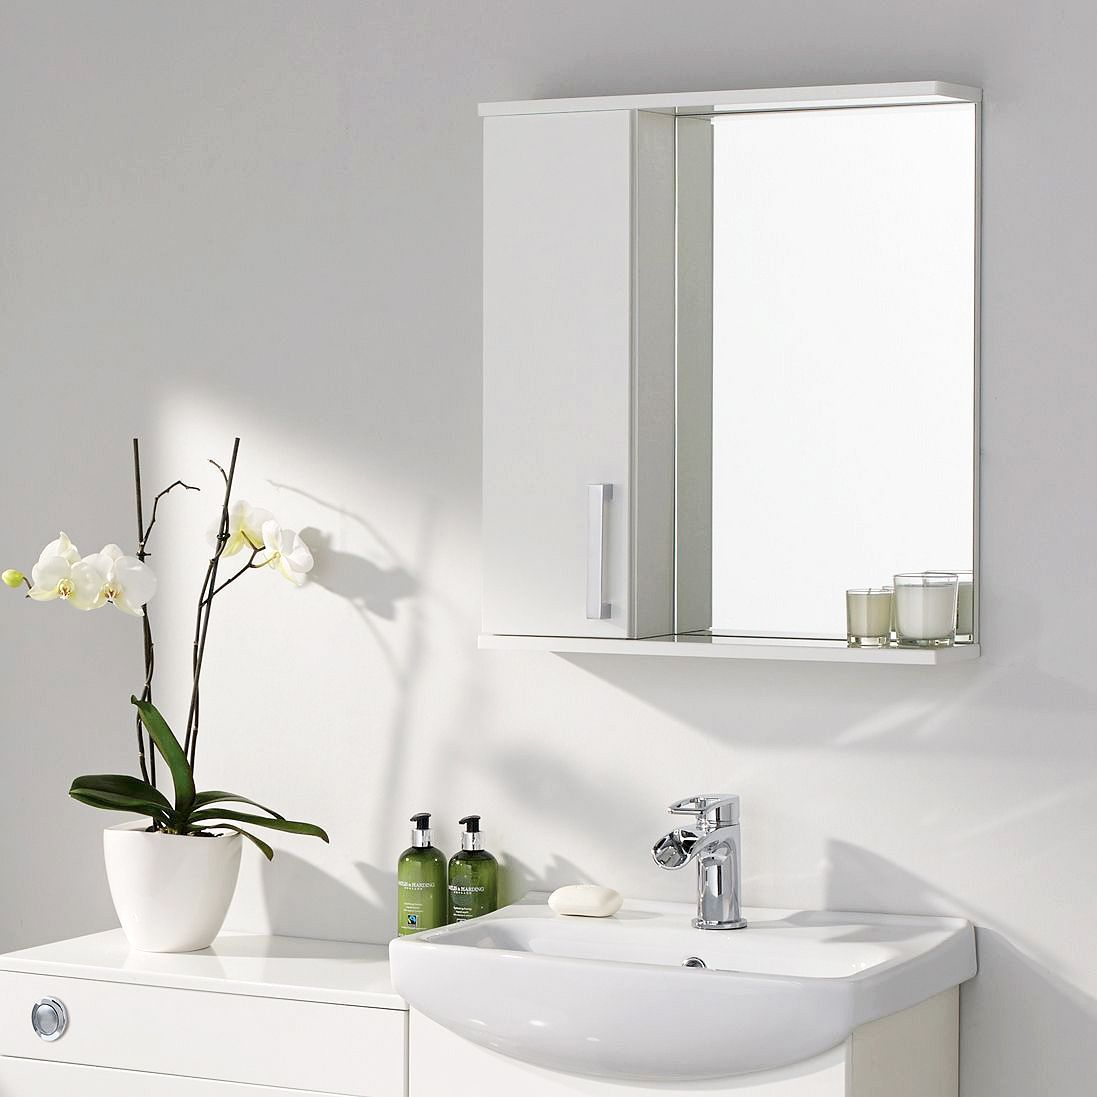 bathroom cabinets furniture bathroom storage diy at bq